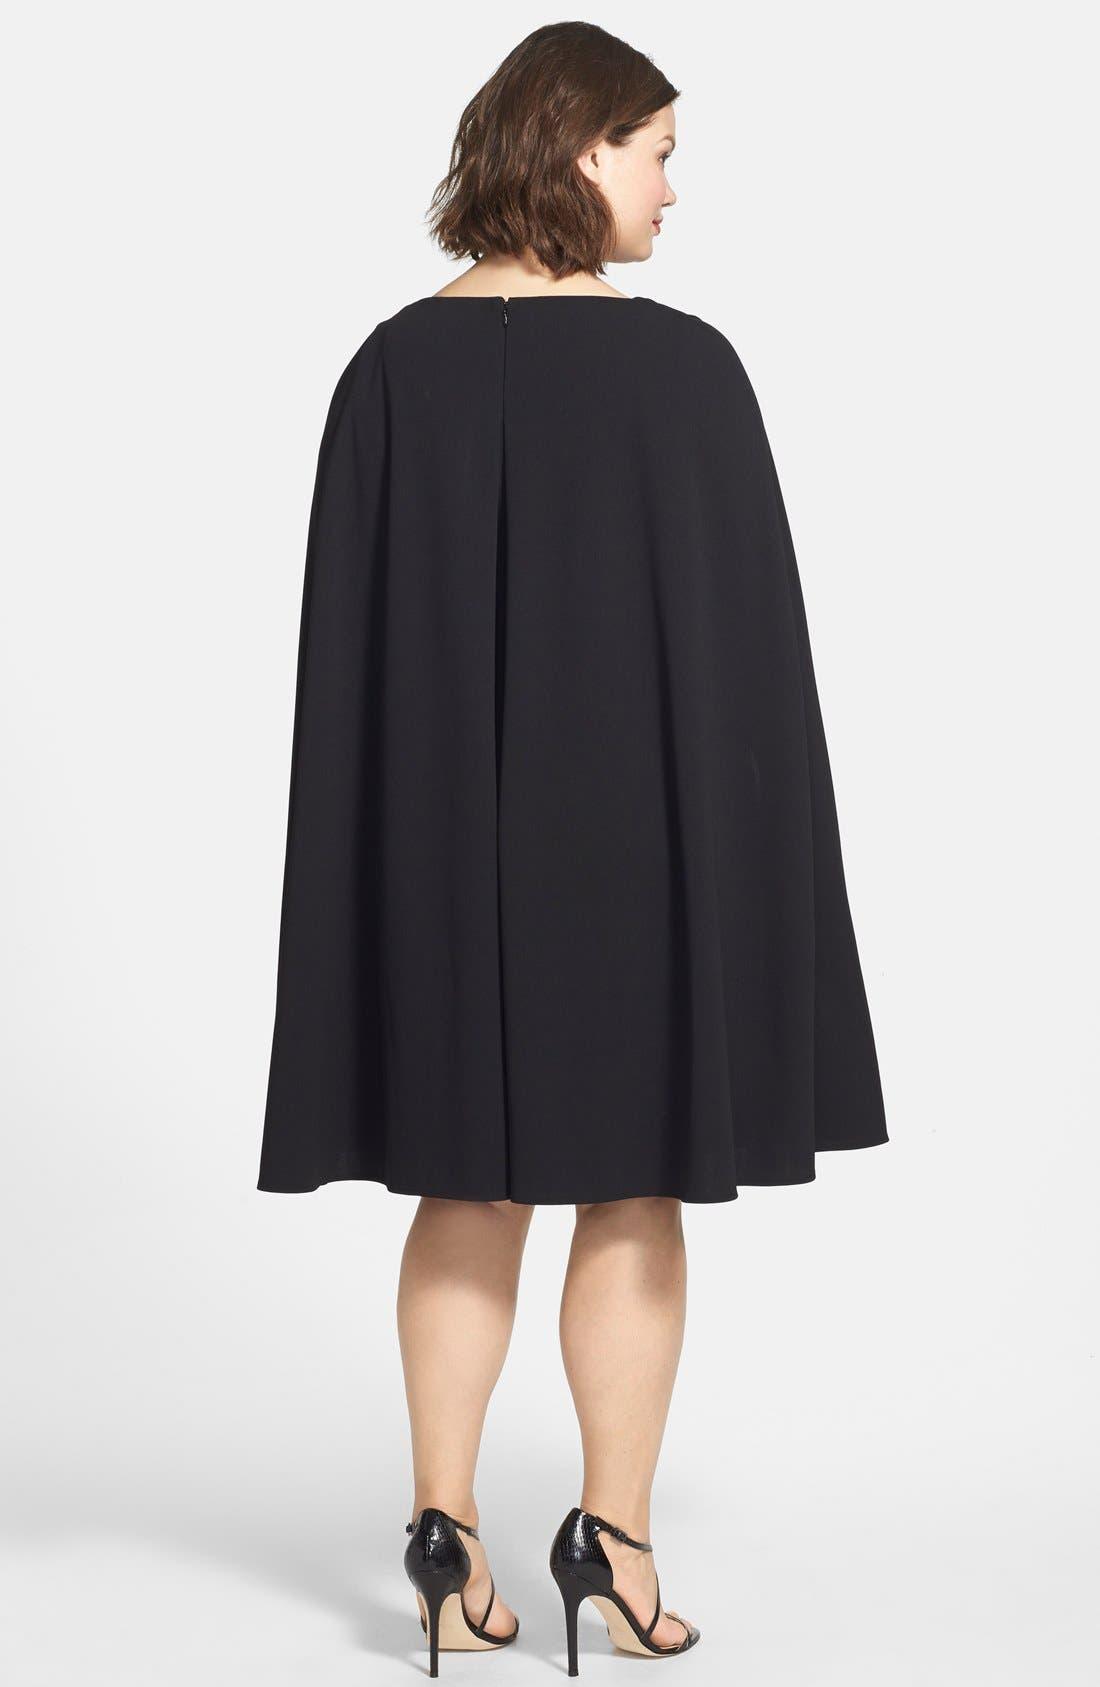 Cape Sheath Dress,                             Alternate thumbnail 9, color,                             001